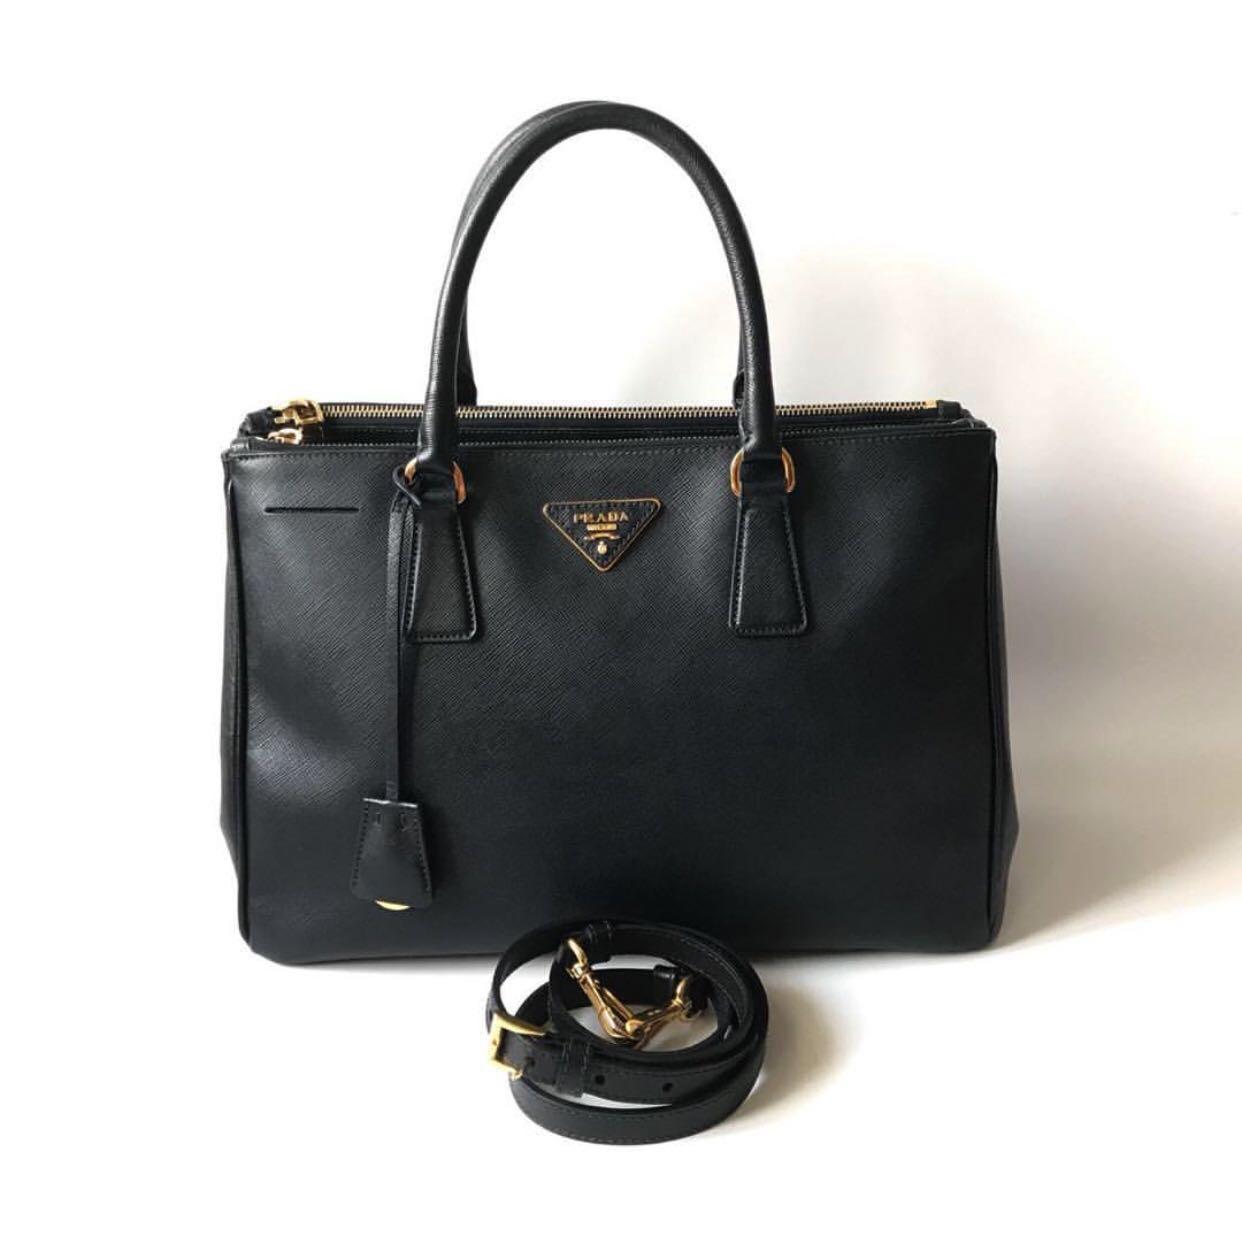 b7b26aa5db12 Prada bag [SALE], Luxury, Bags & Wallets, Handbags on Carousell